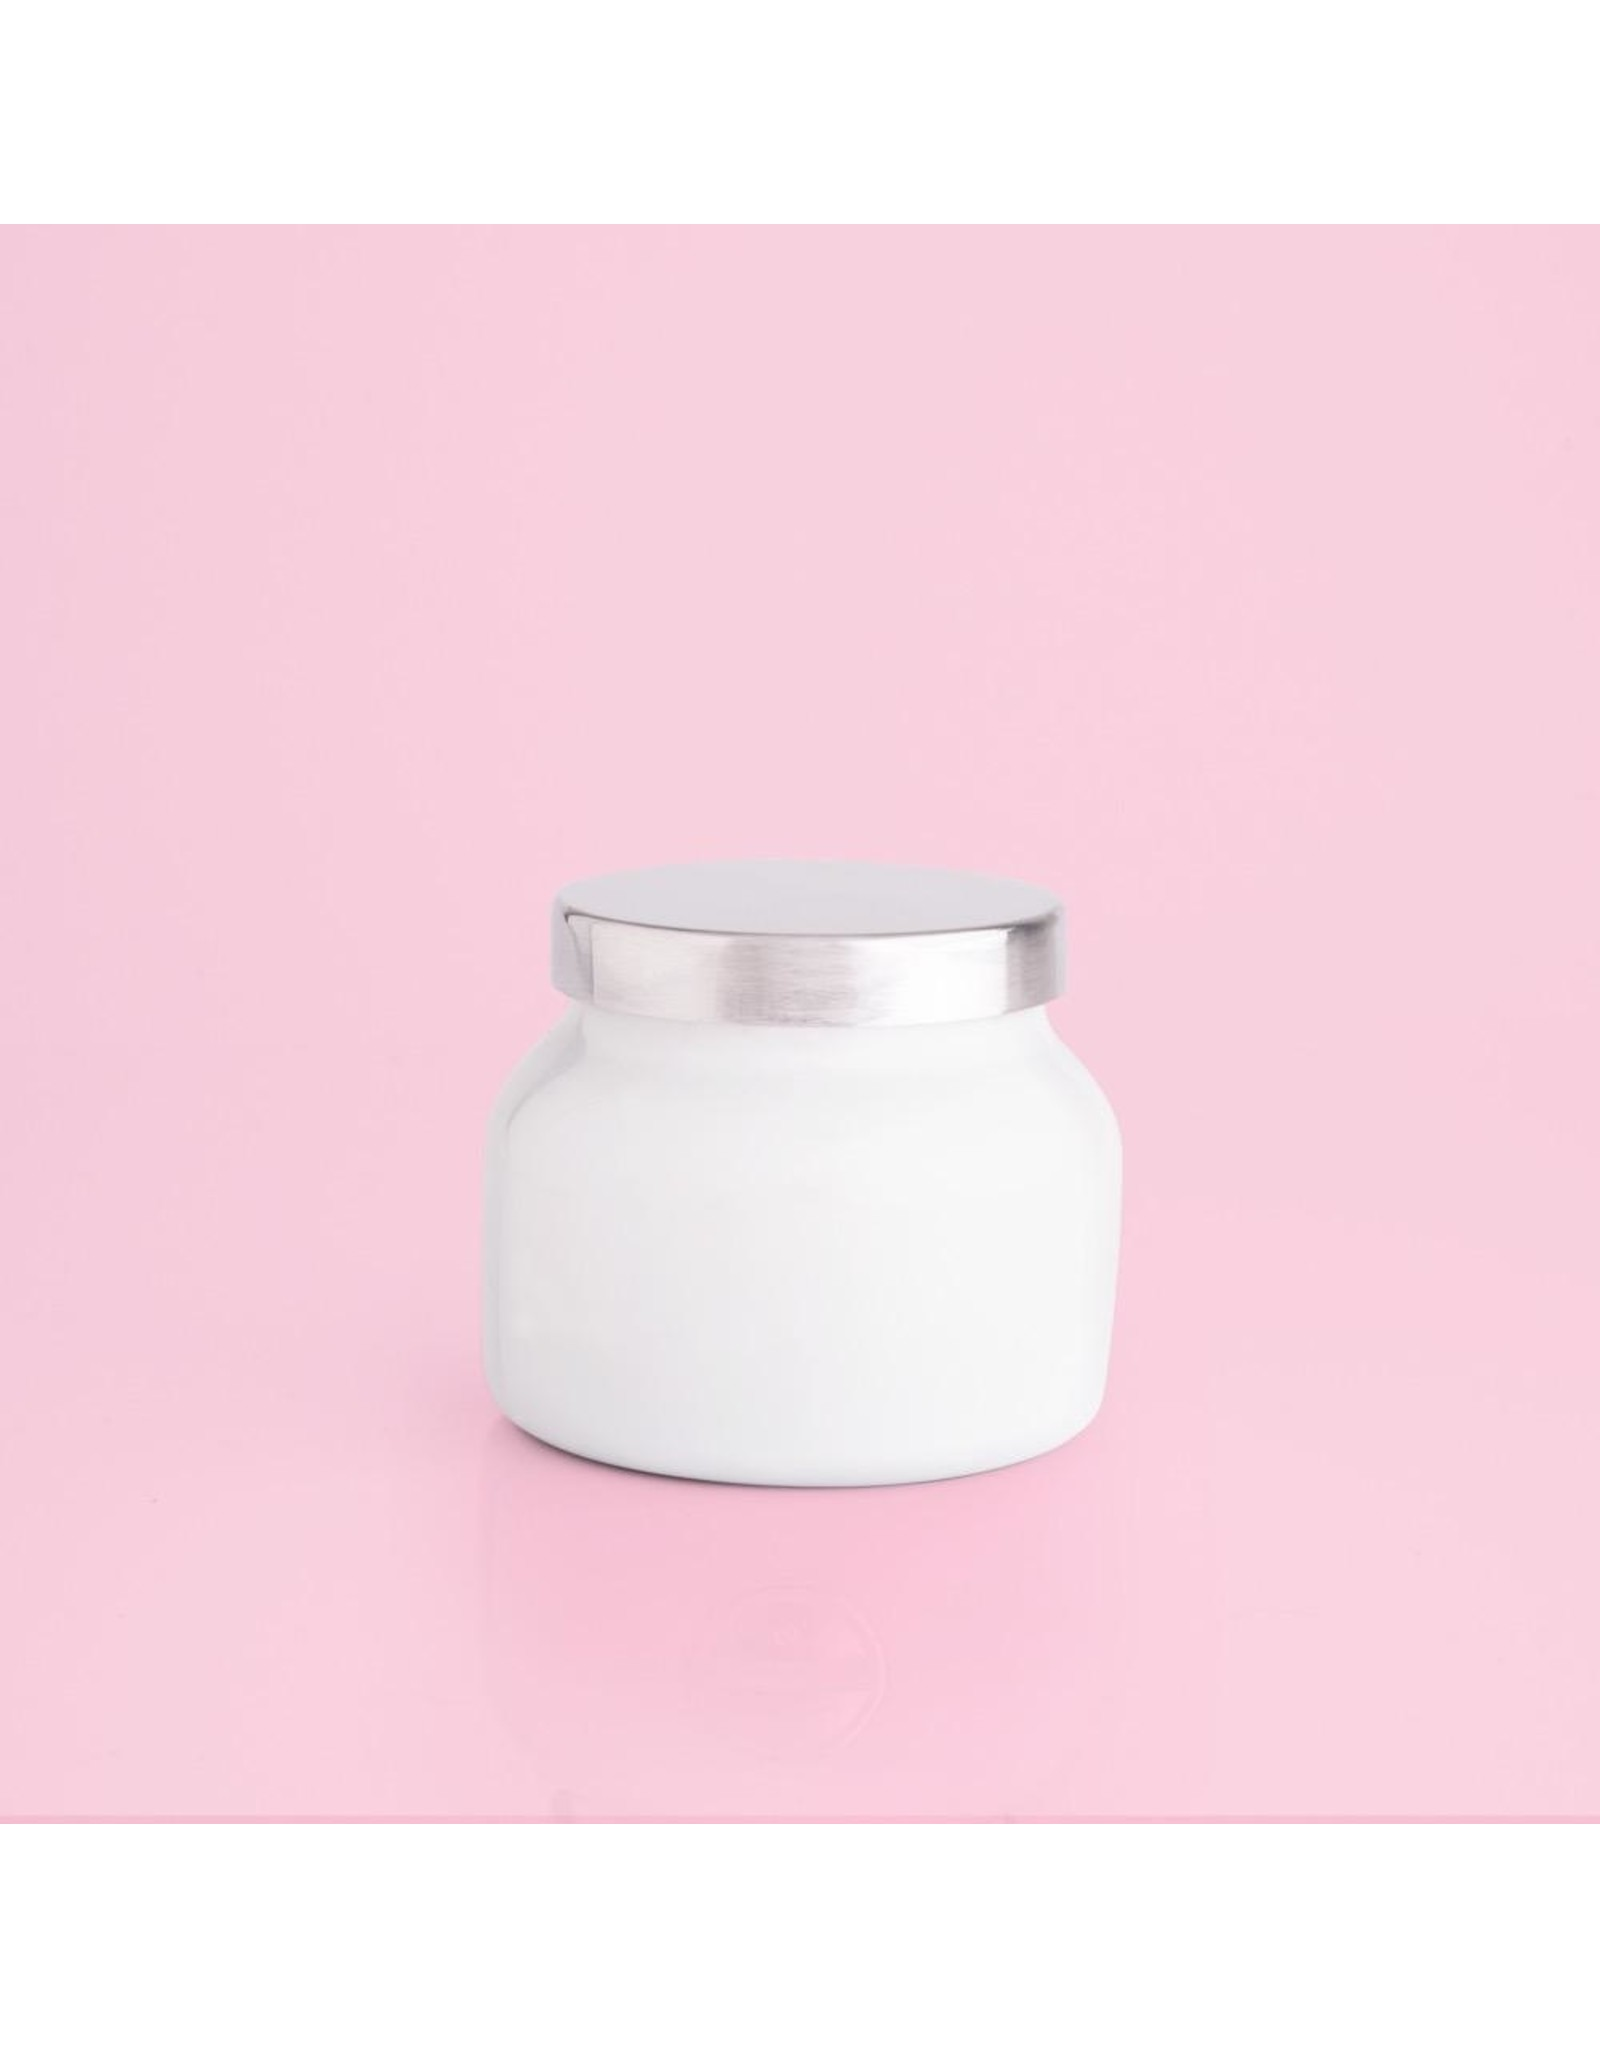 capri BLUE Volcano Candle White Petite Jar 8 Oz